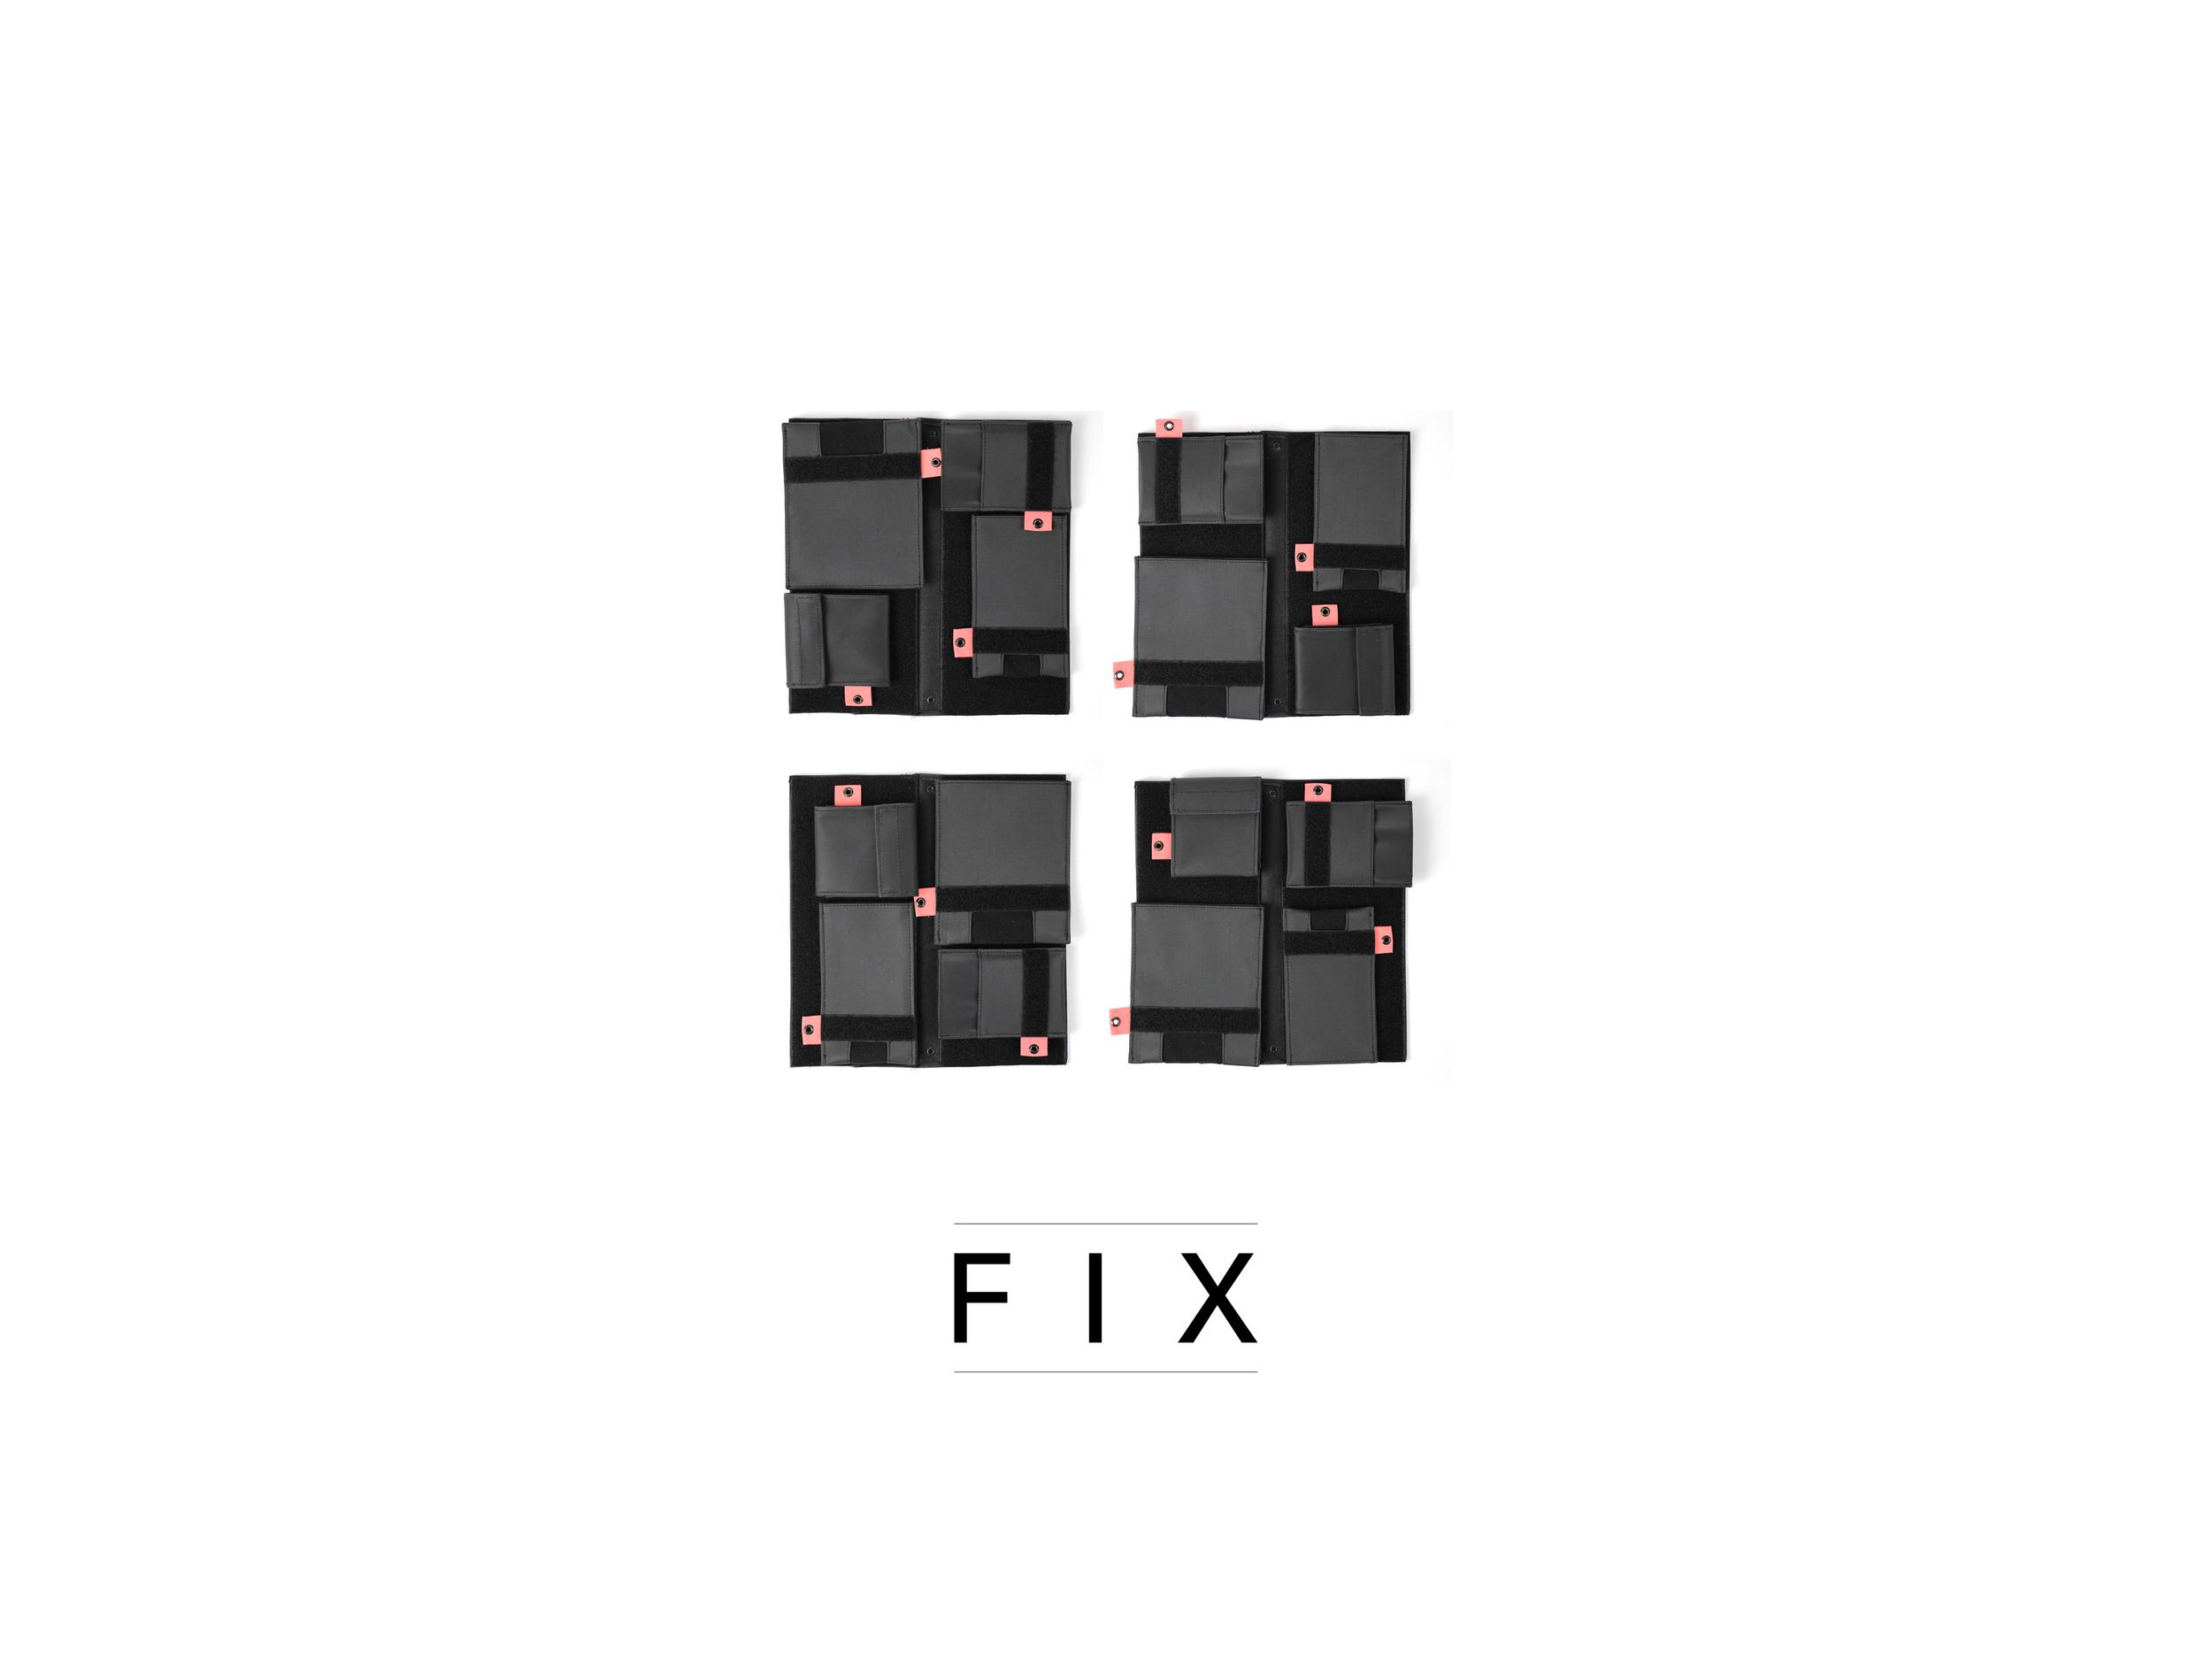 FIX photos12.jpg